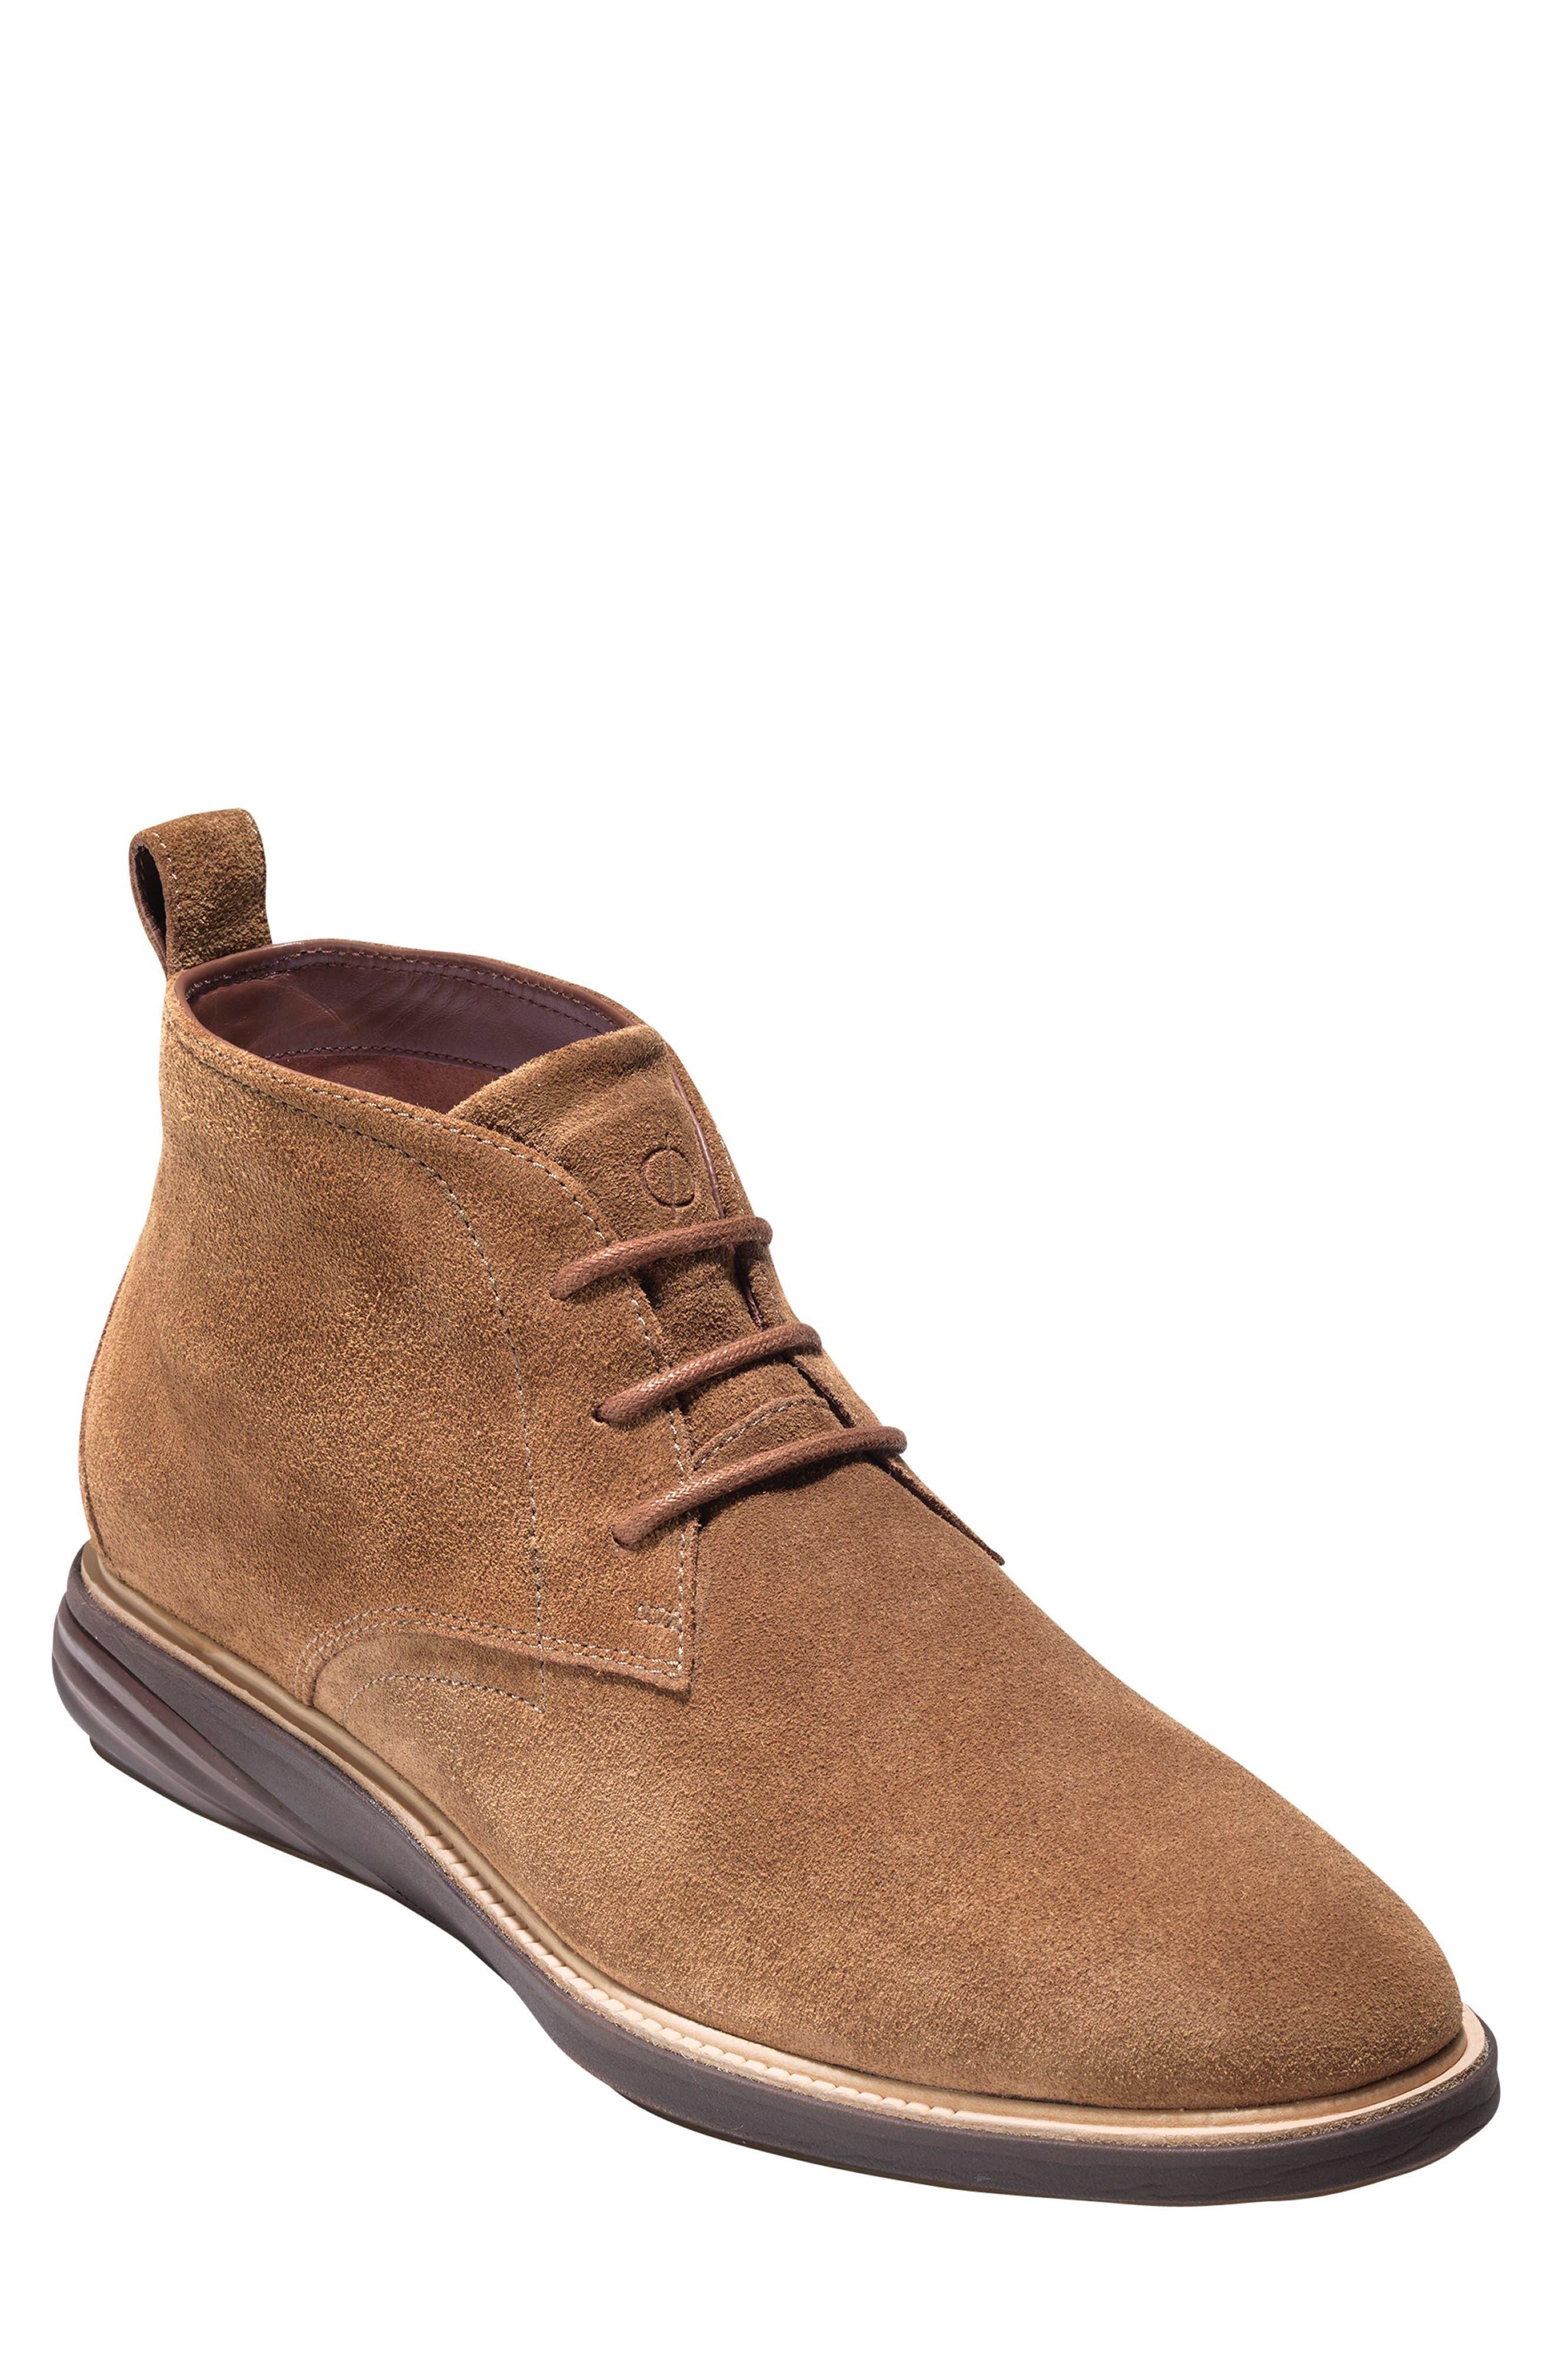 Grand Evolution Leather Chukka Boot